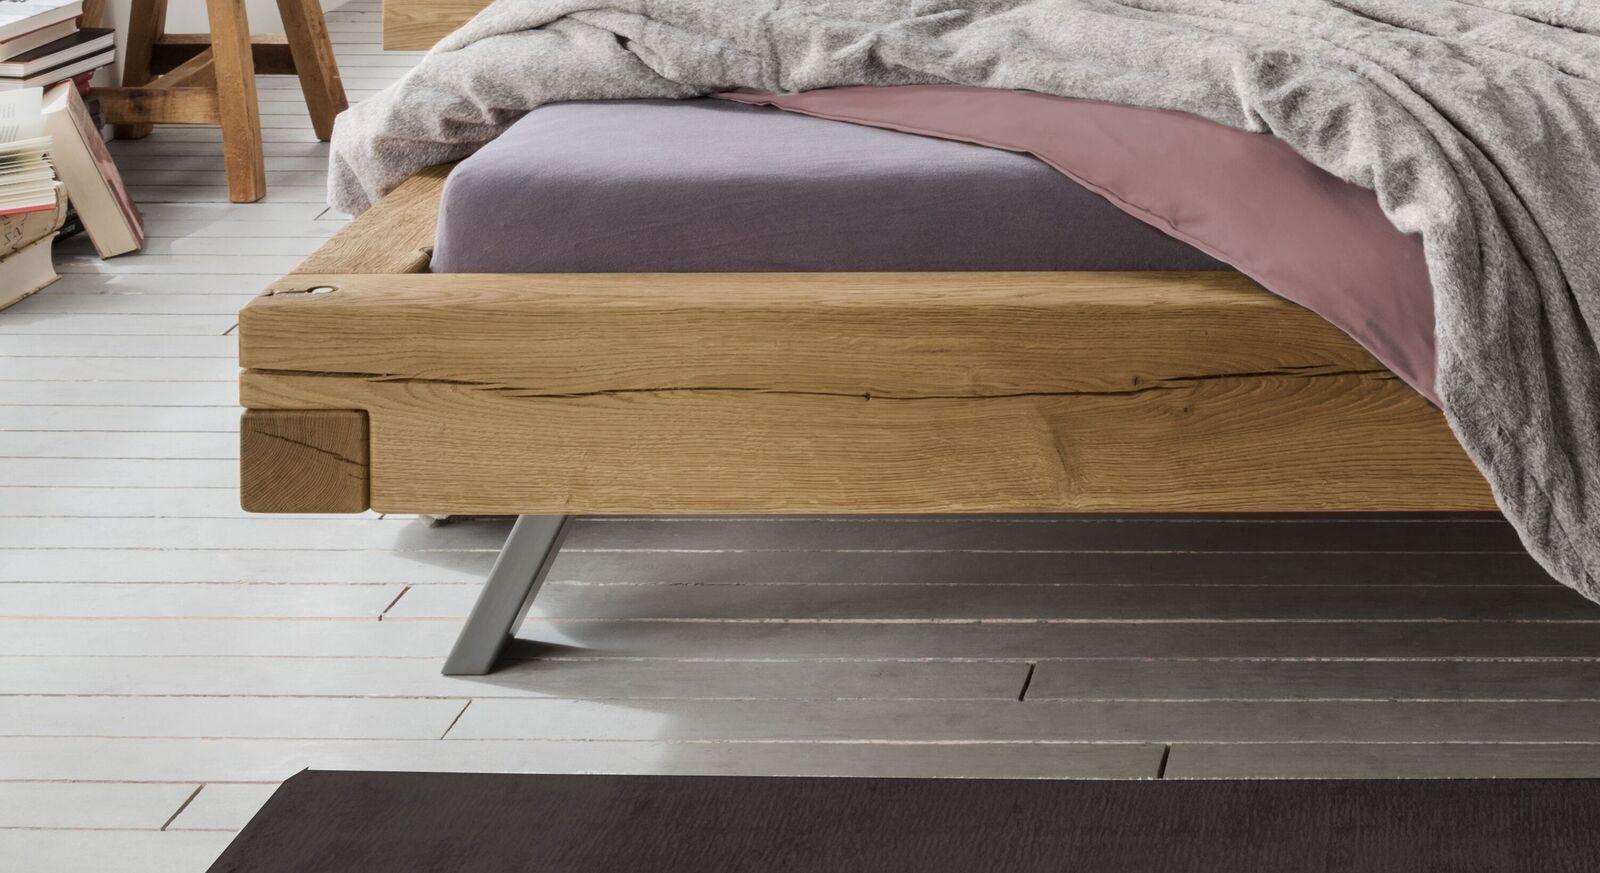 Bett Rune mit filigranen Stahlfüßen